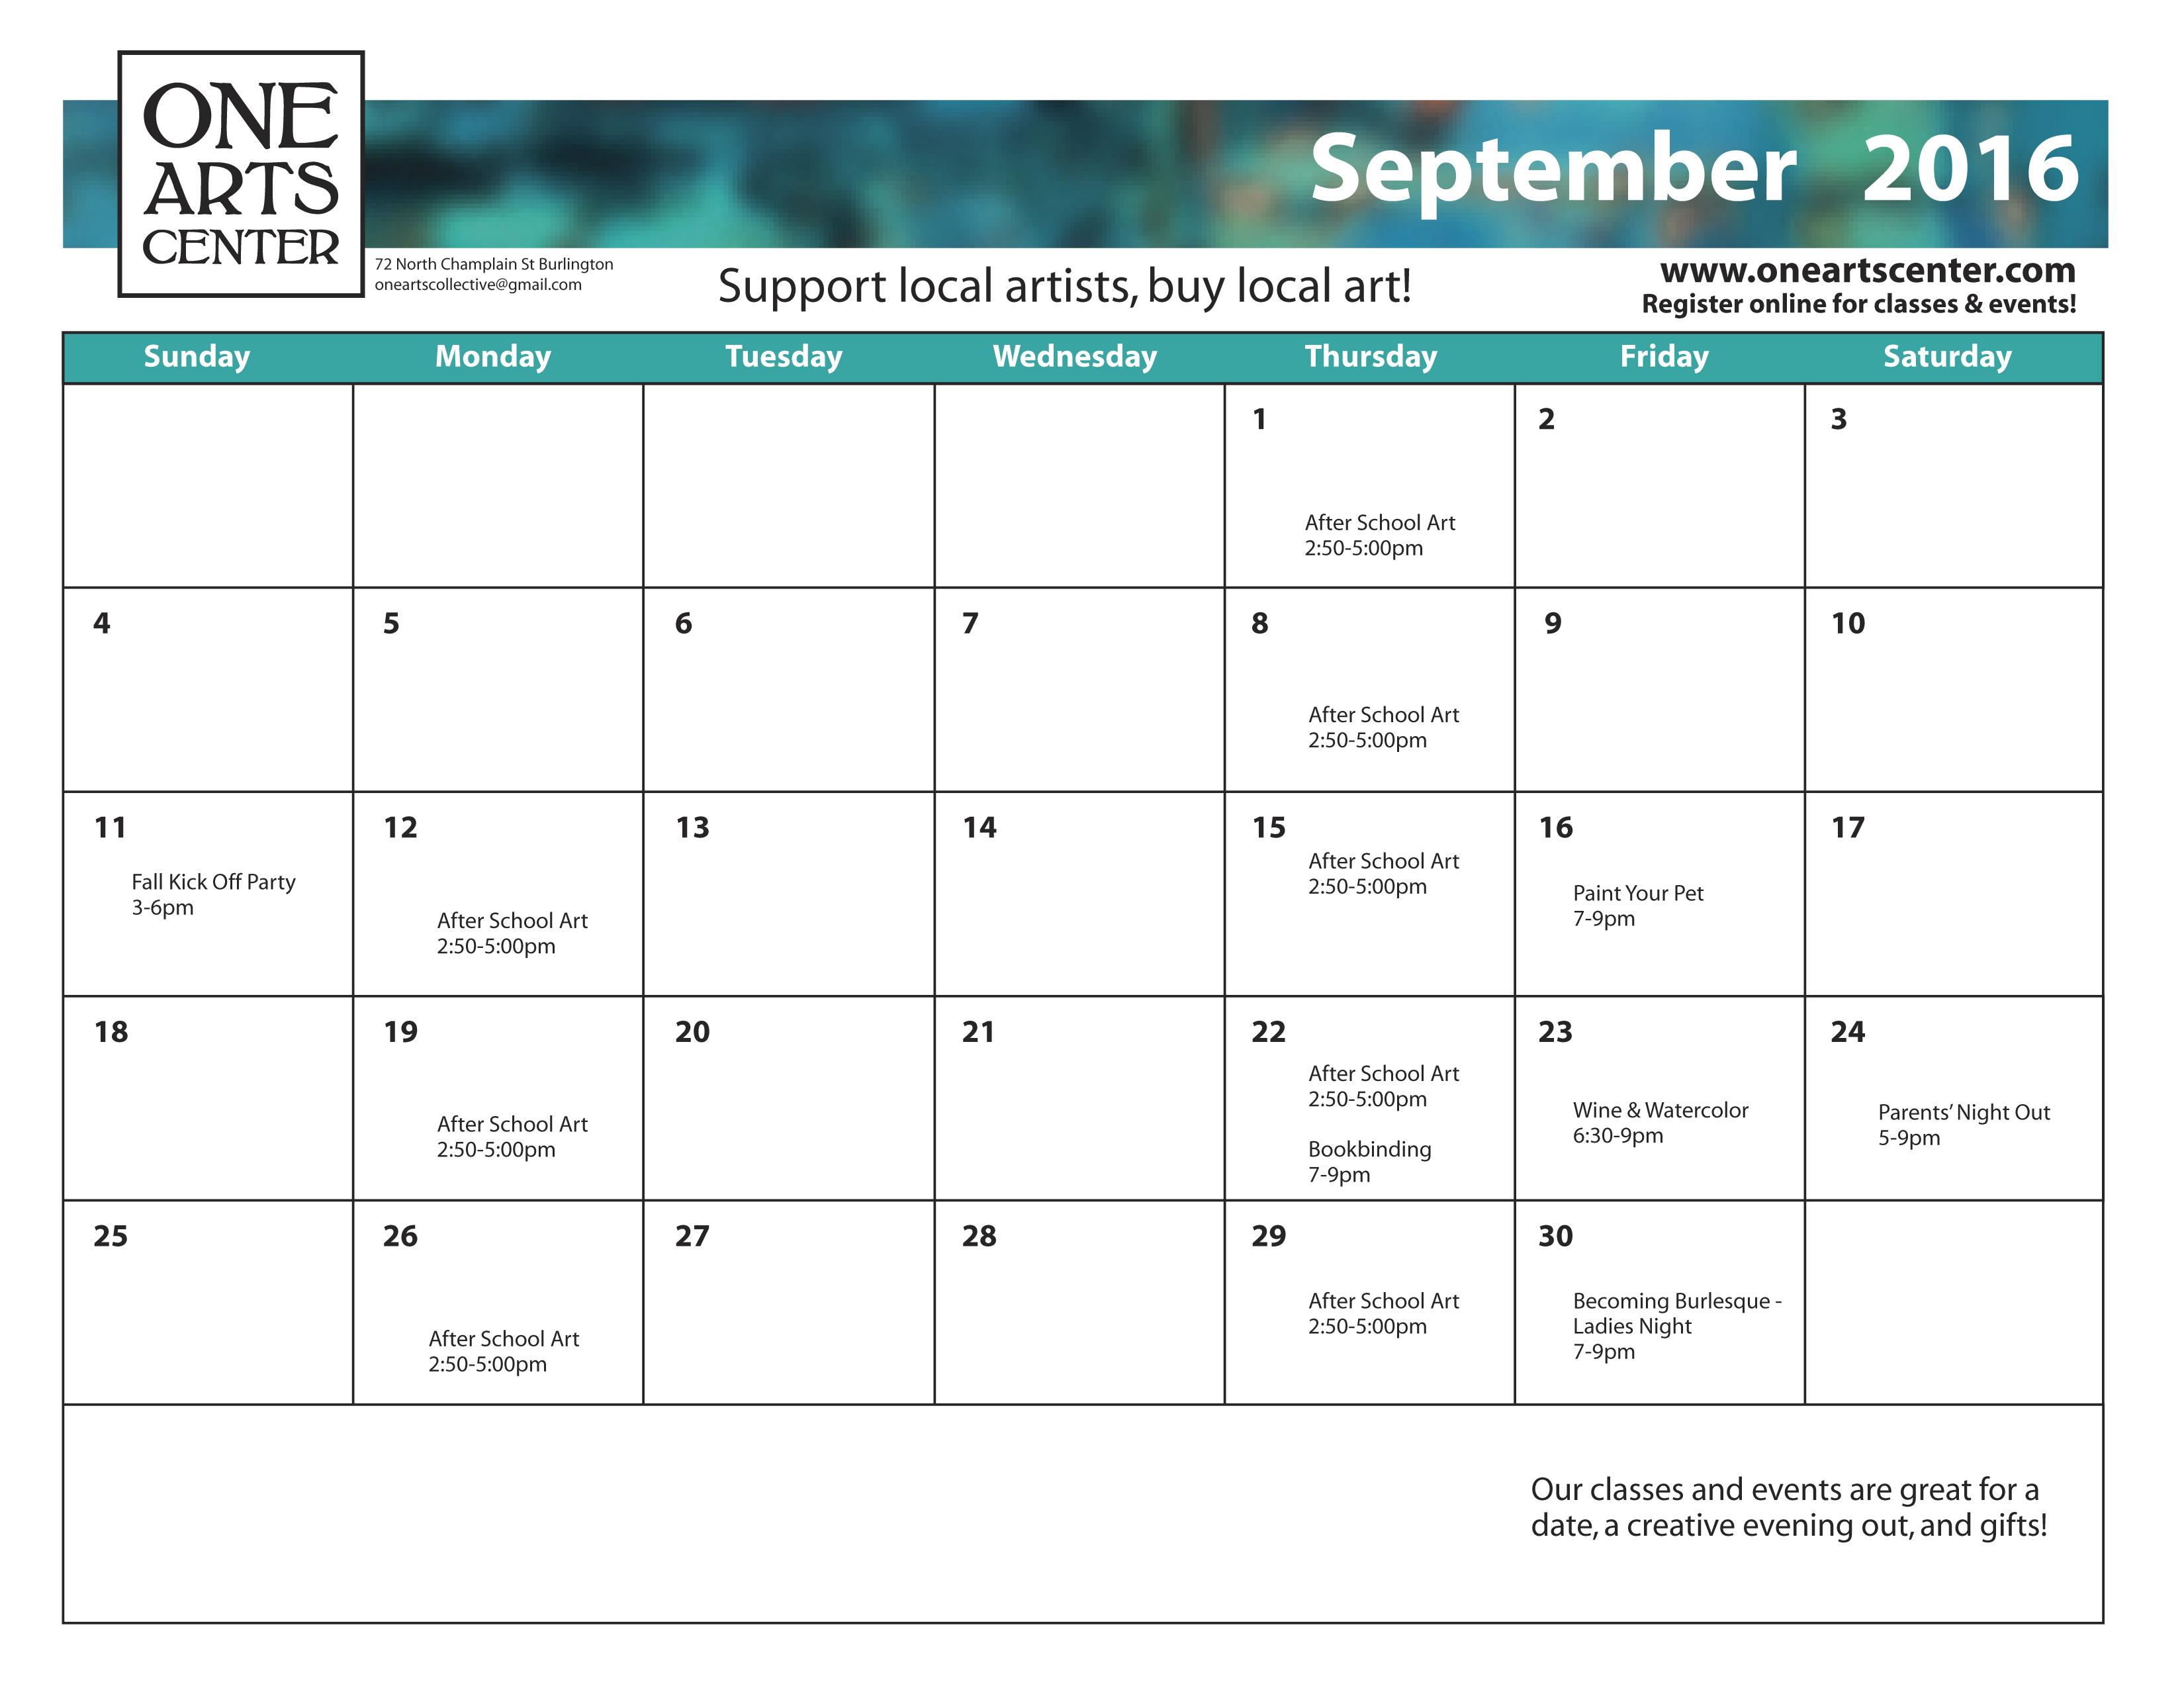 September calendar of events